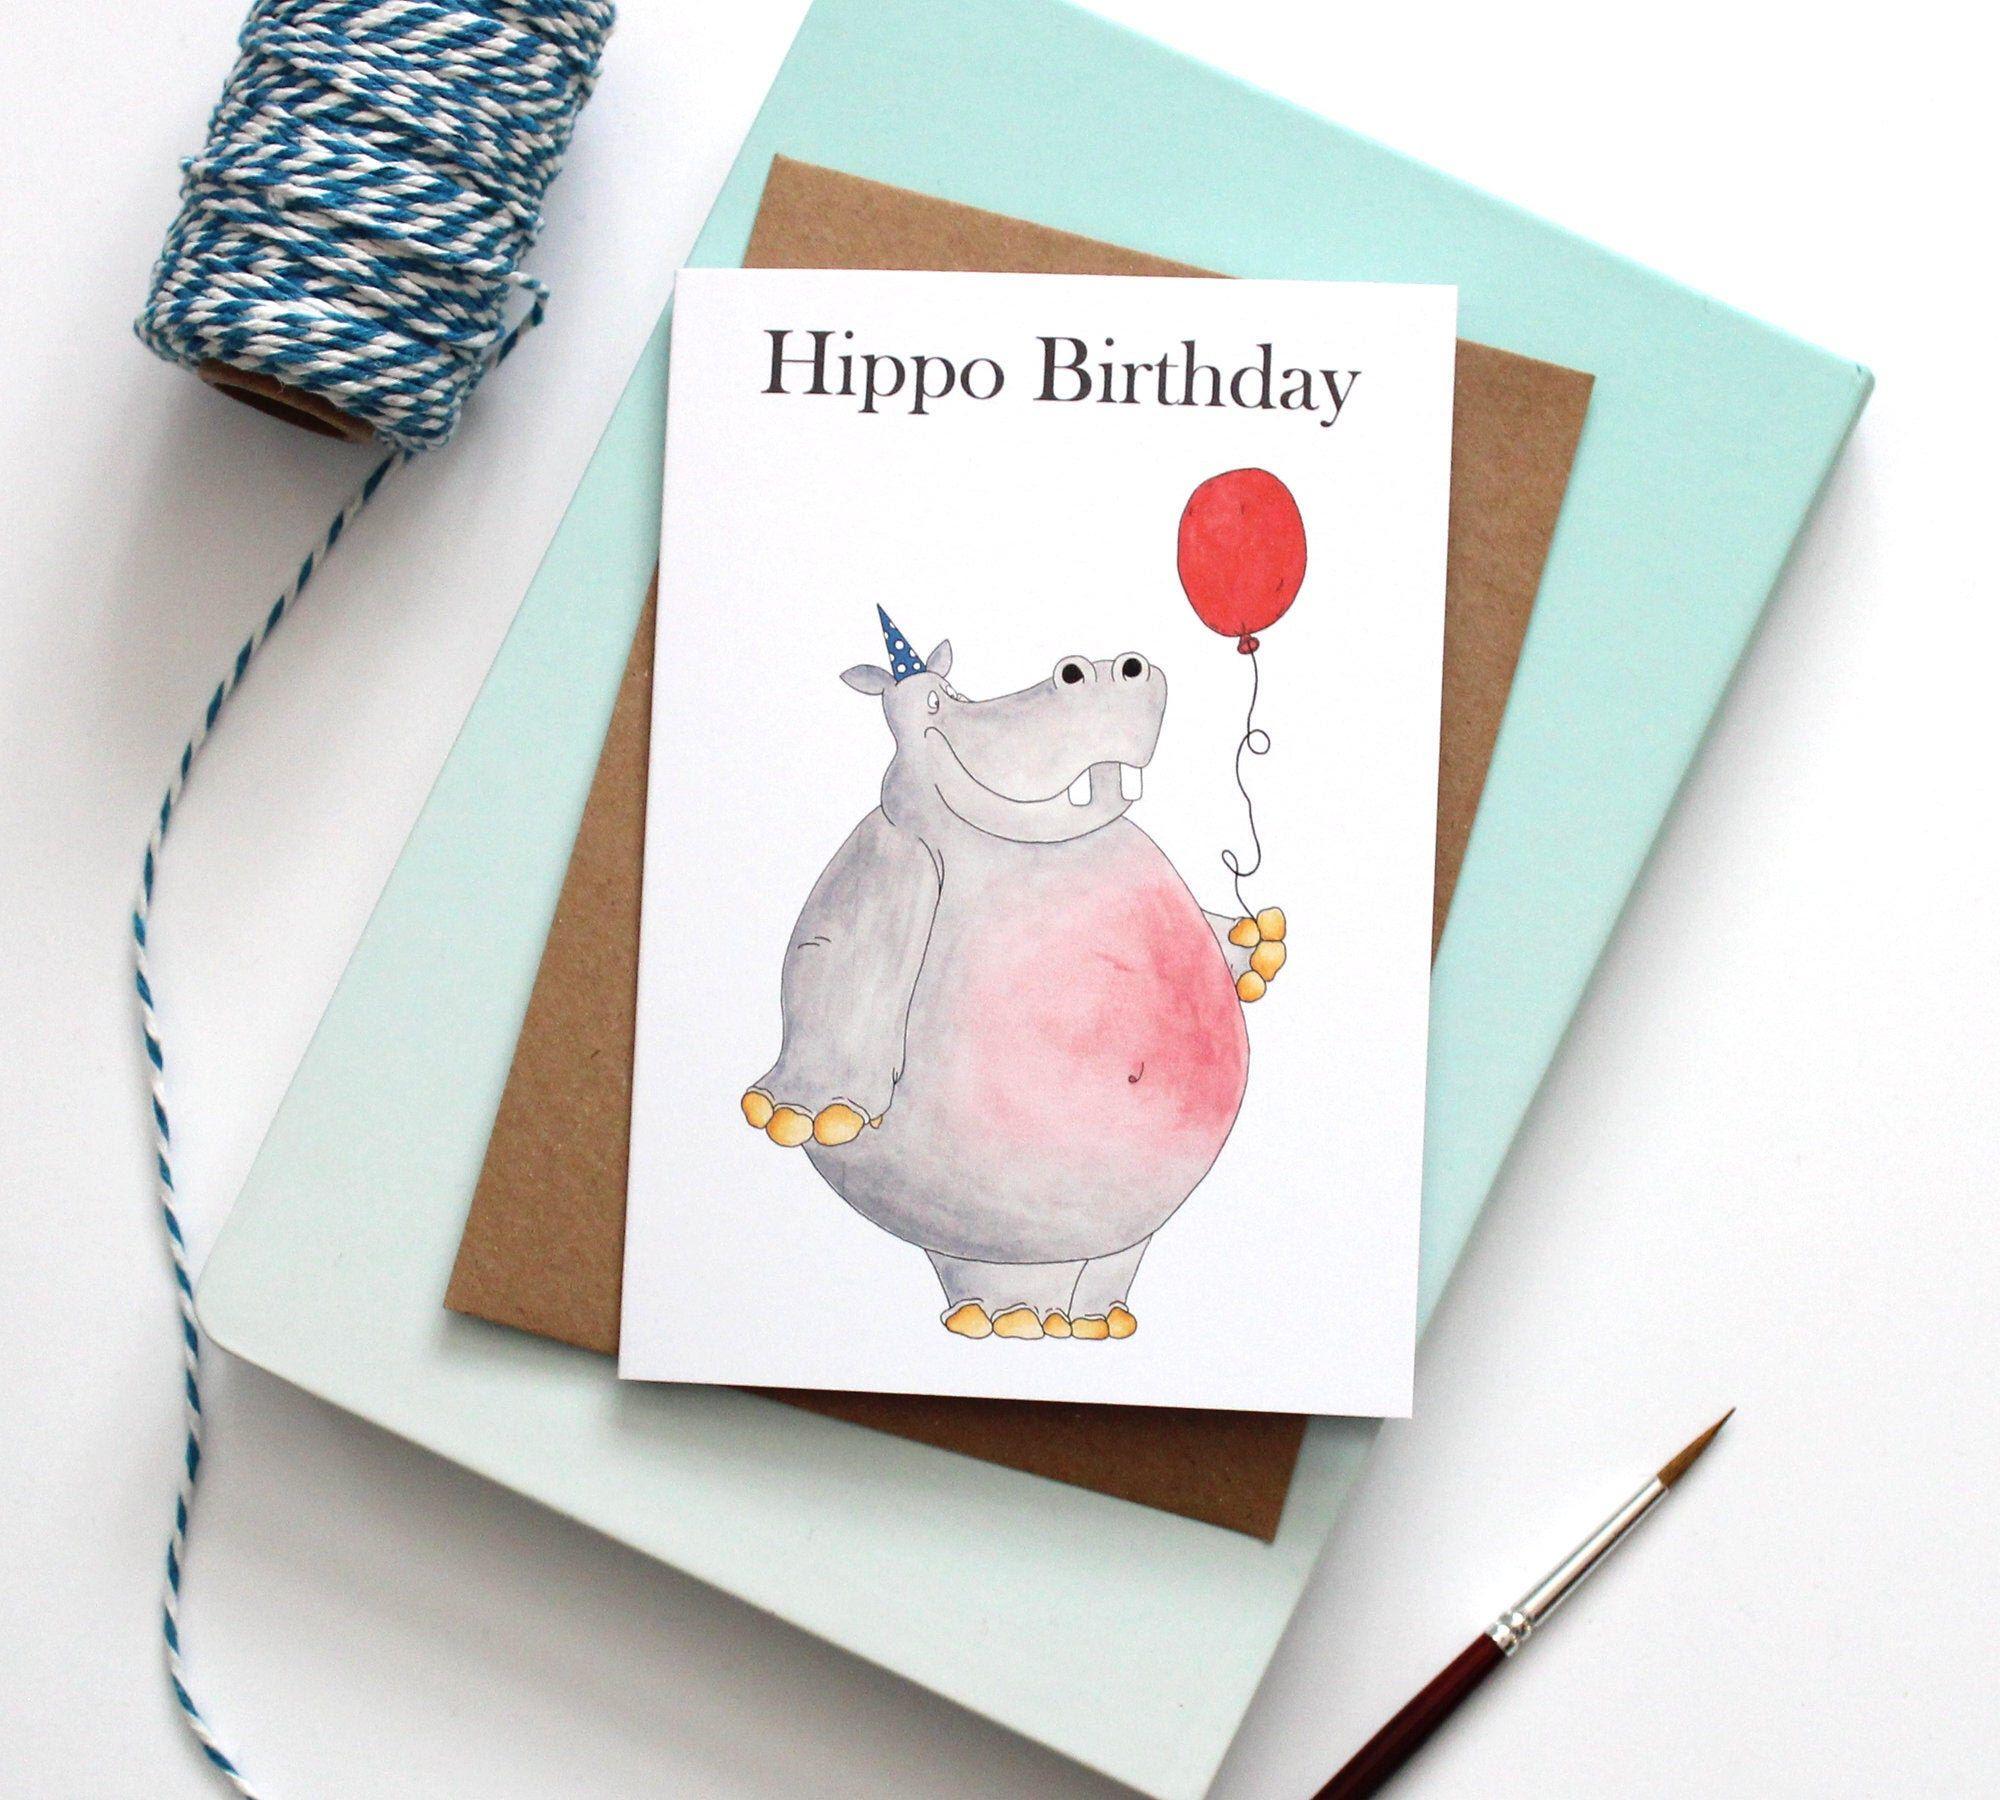 Hippo Birthday Birthday Card Pun Greeting Card Happy Etsy Birthday Card Puns Happy Birthday Greeting Card Birthday Cards